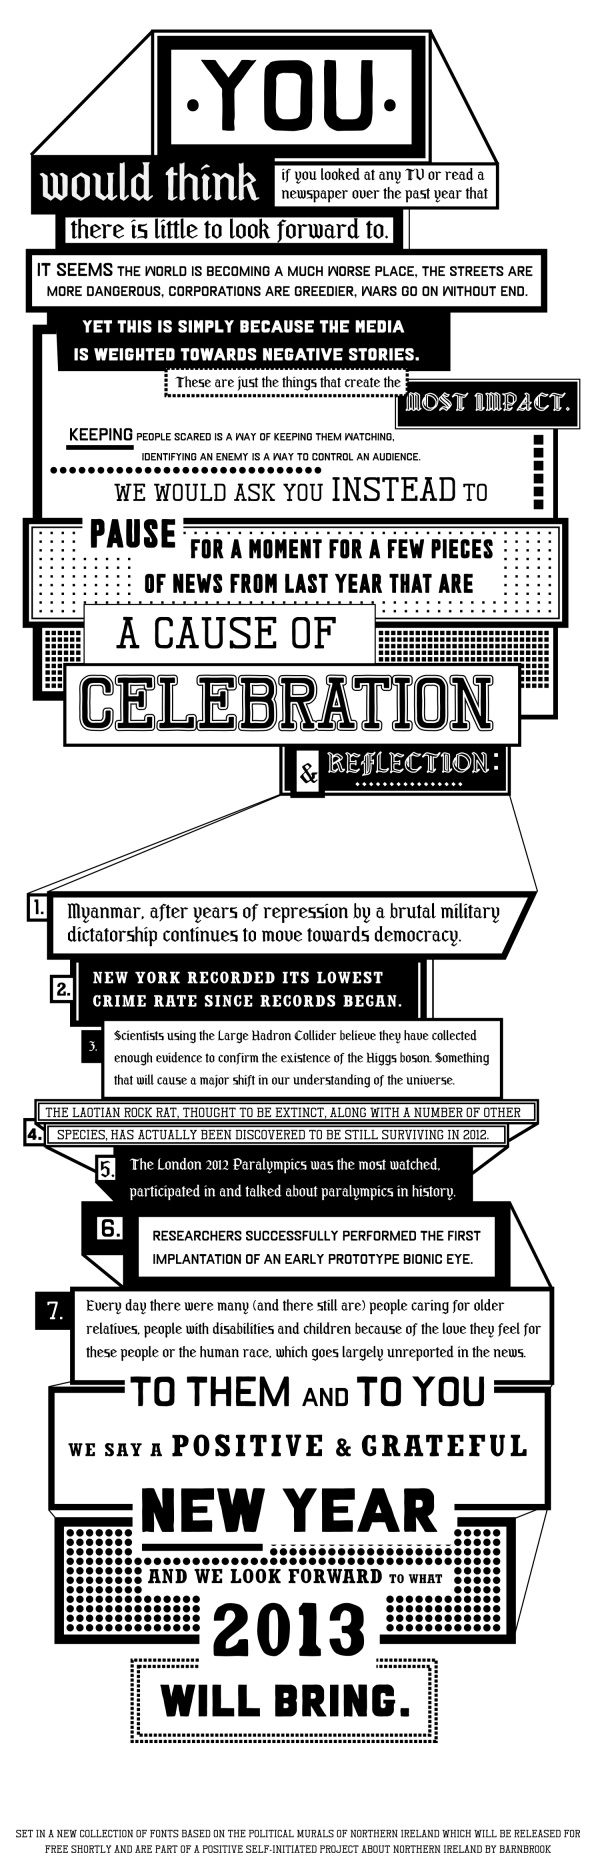 Jonathan Barnbrook's New Year's message.